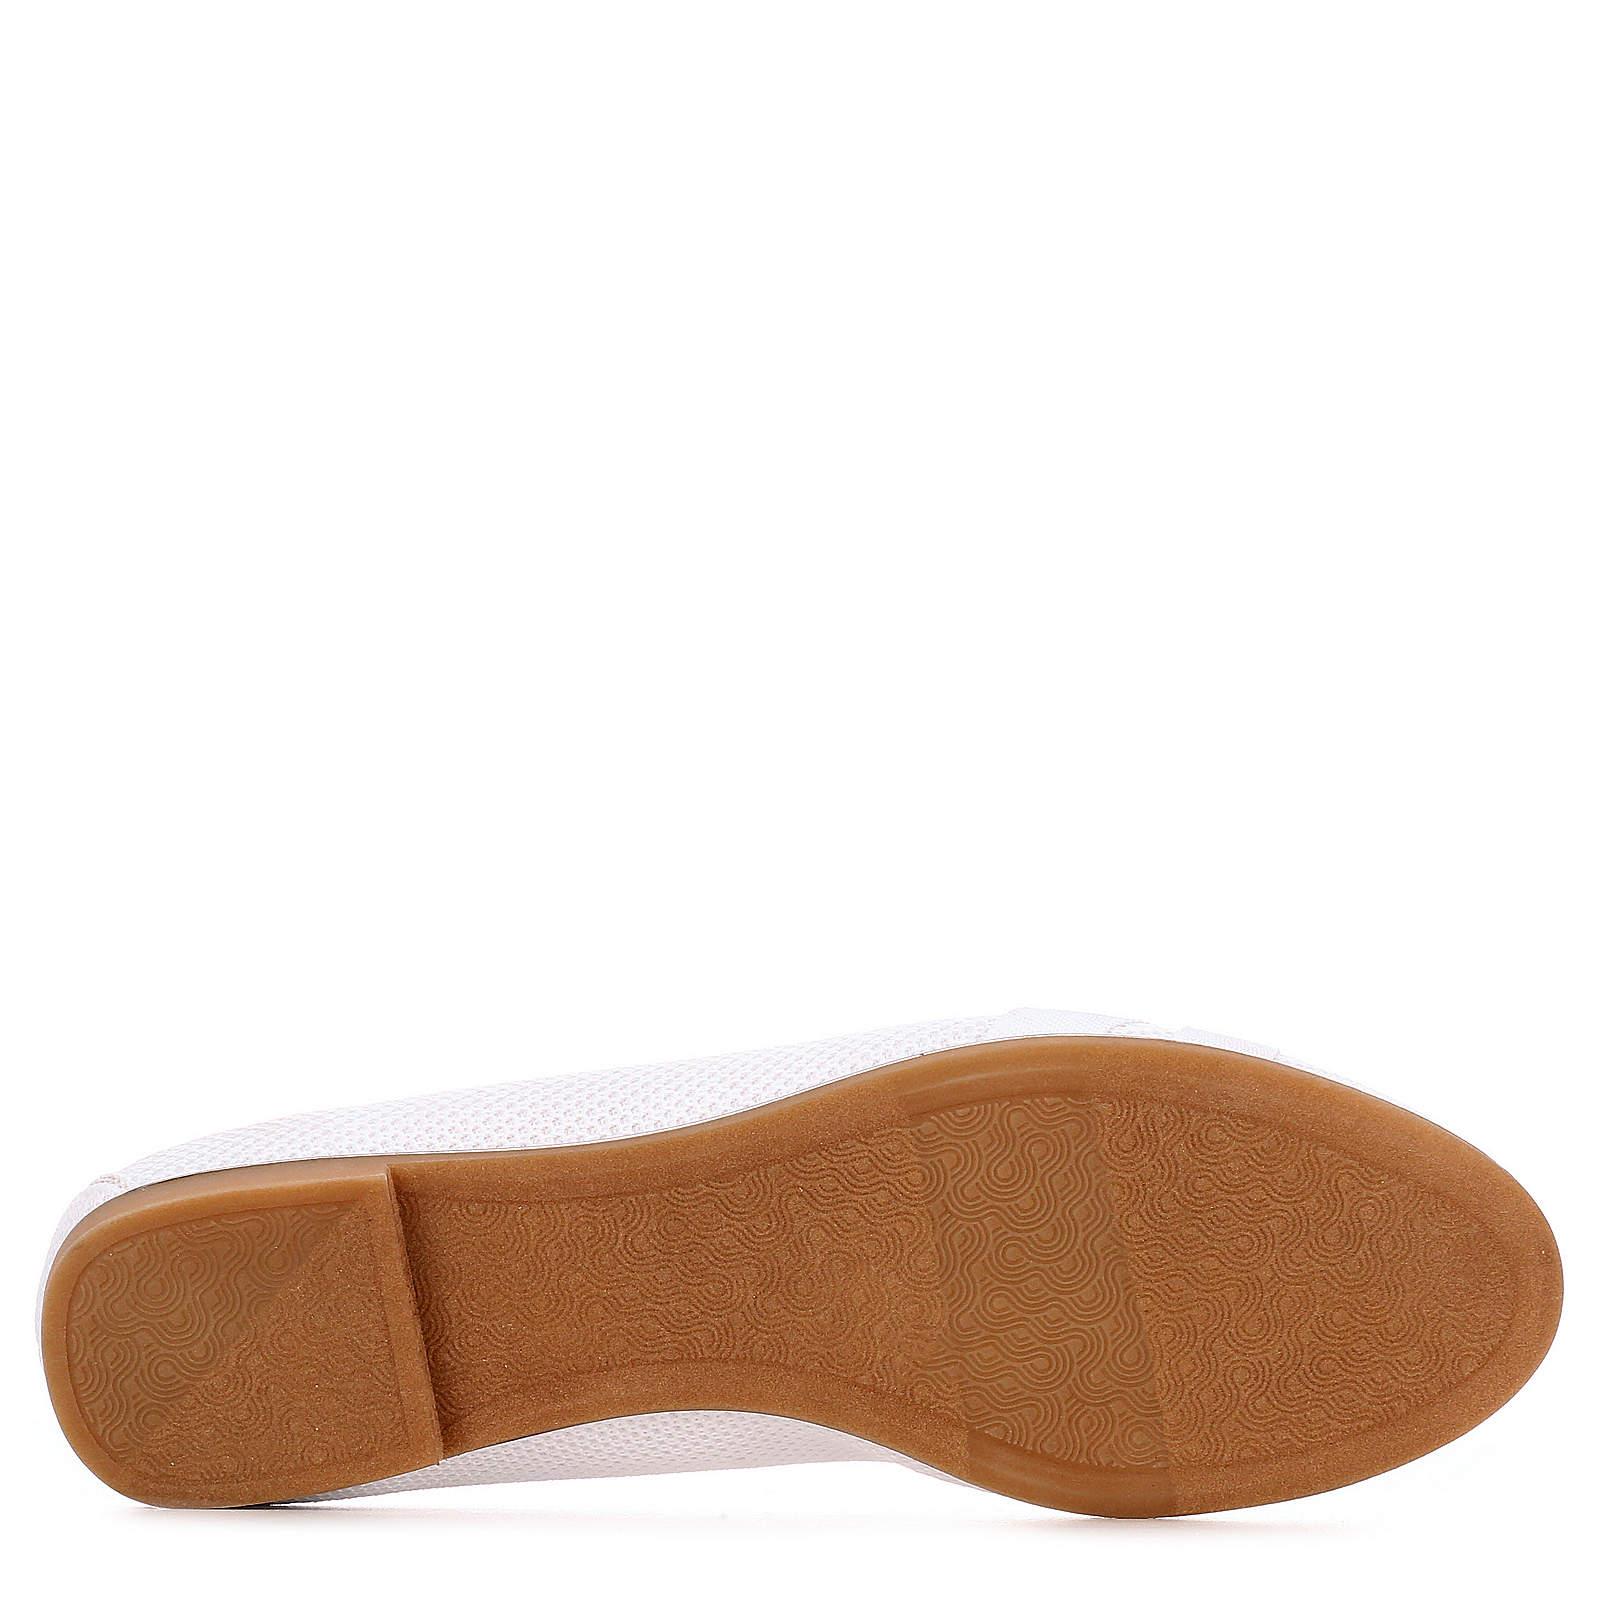 XAPPEAL-Womens-Mitzie-Slip-On-Mesh-Flat-Shoes thumbnail 15